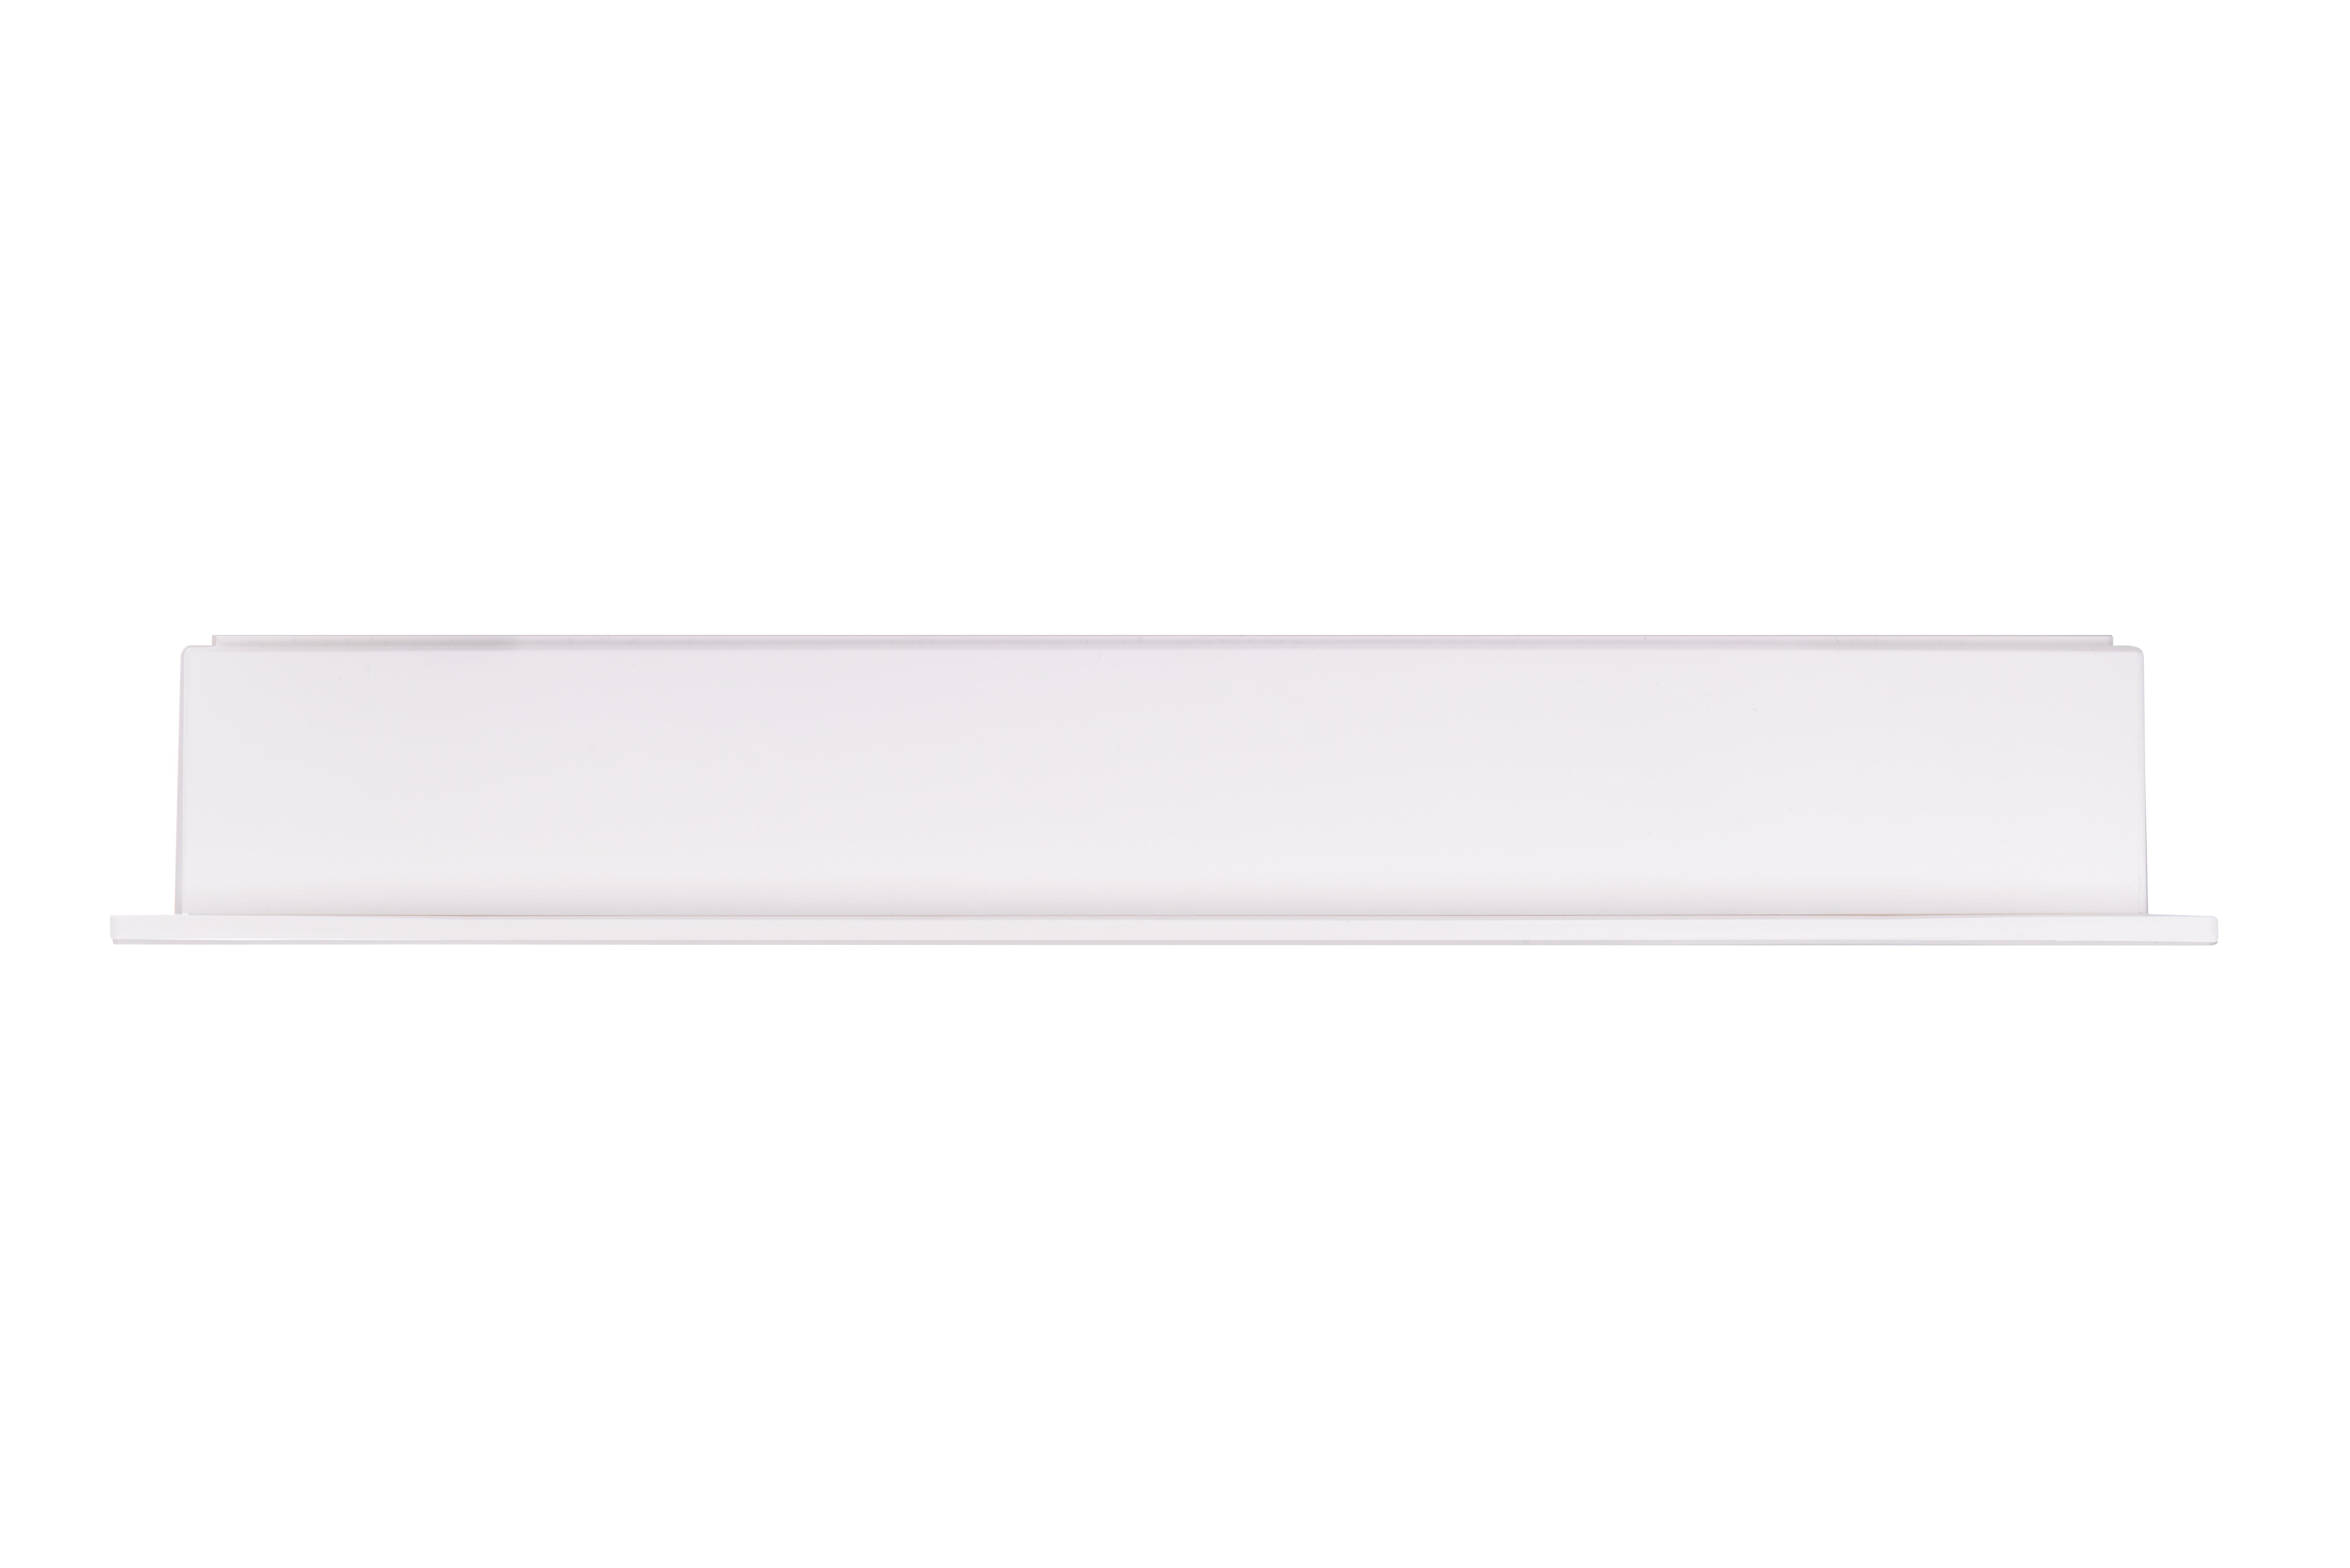 Lampa emergenta led Intelight 94523   3h nementinut test automat 5